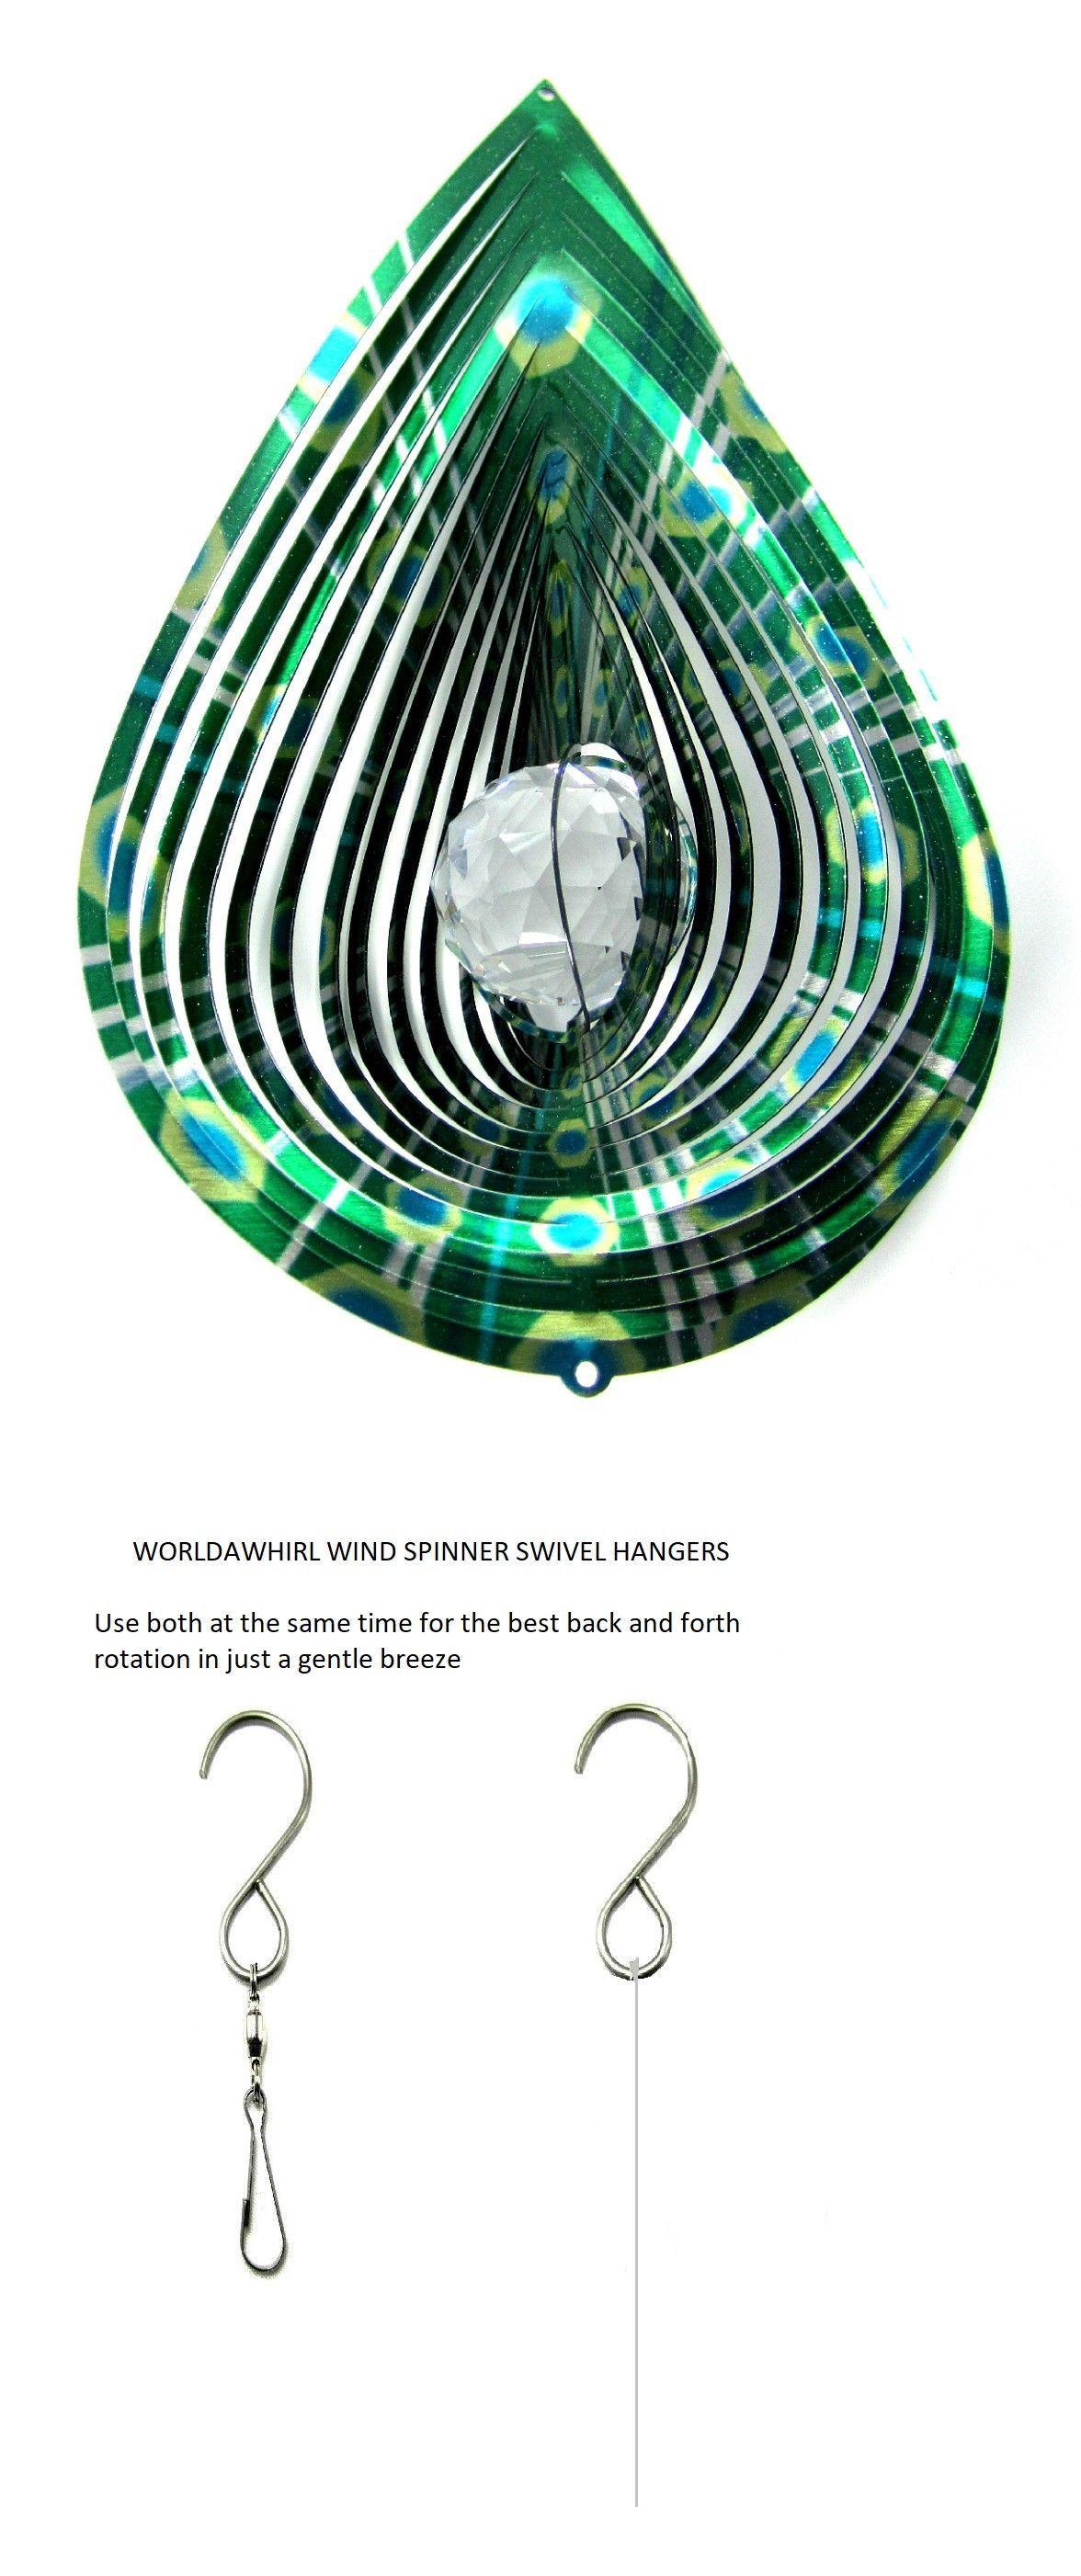 WorldaWhirl Whirligig 3D Cross Wind Spinner Hand Paint Stainless Kinetic Twister